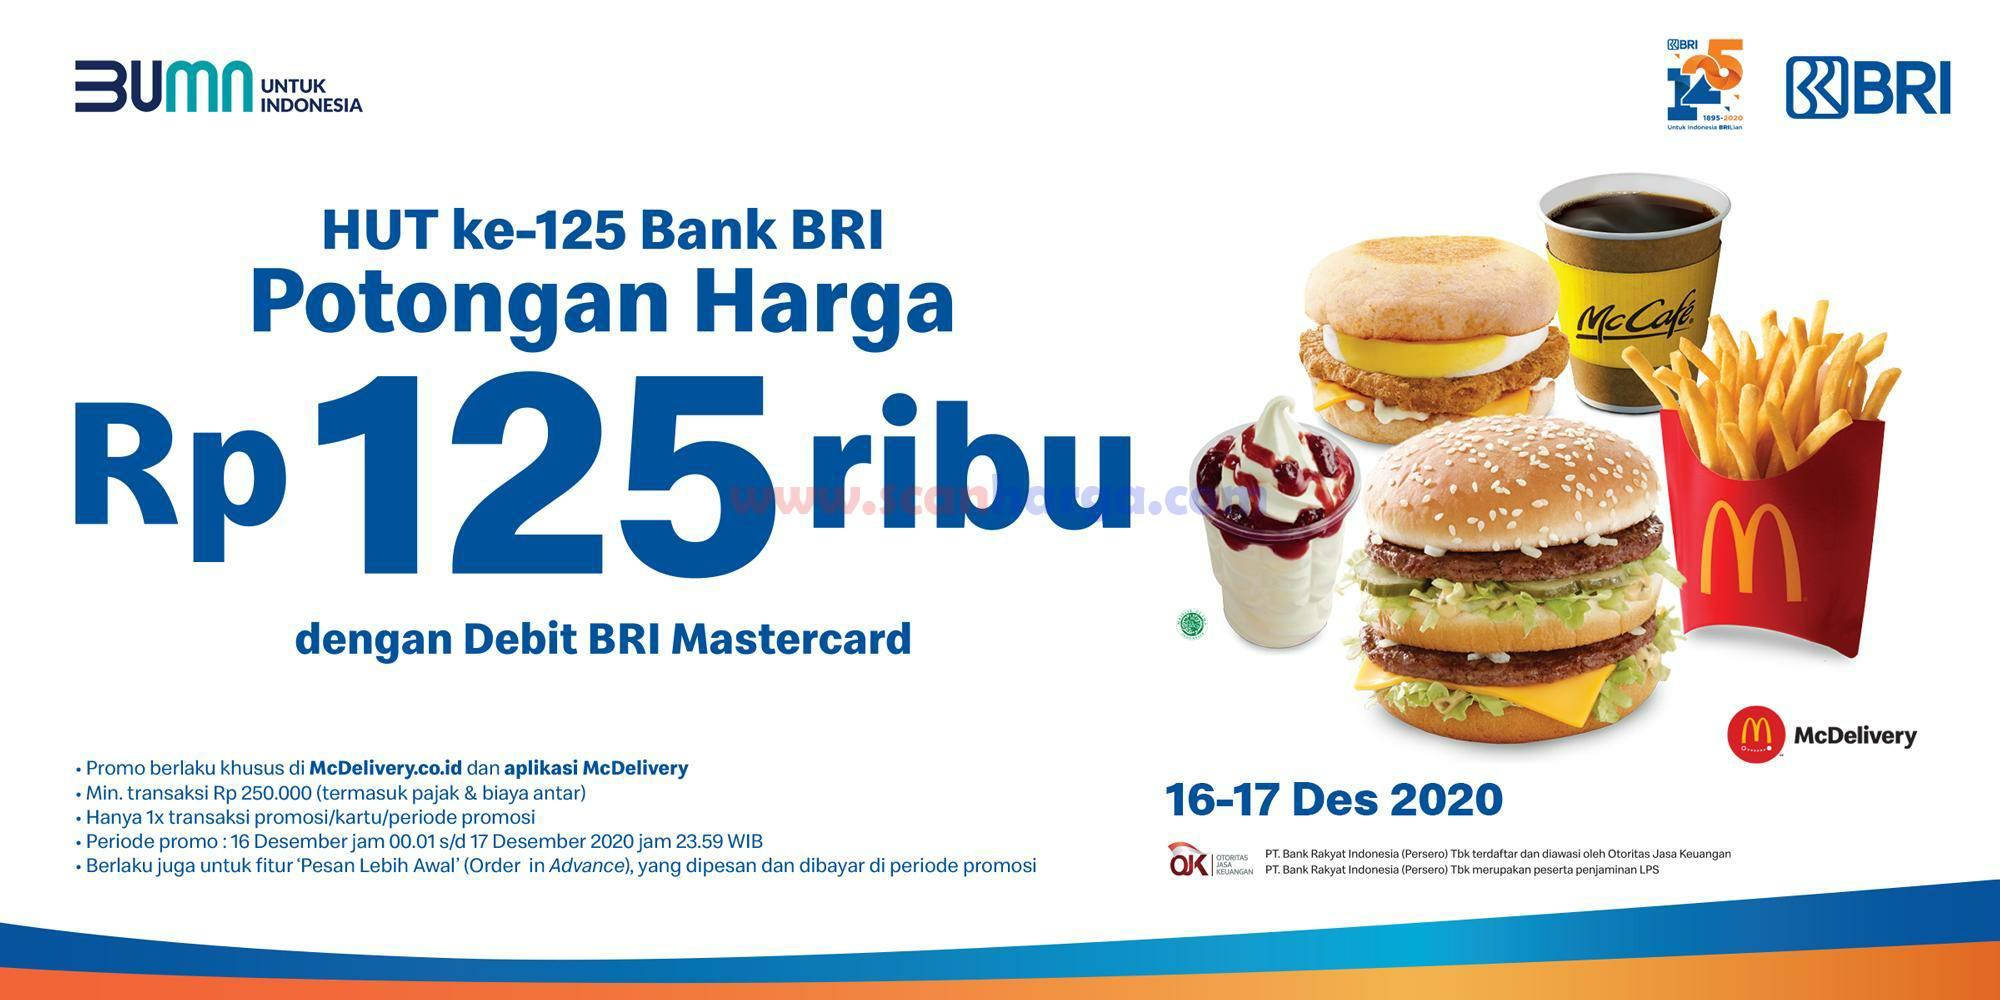 McDonalds Promo HUT BRI ke 125 Periode 16 - 17 Desember 2020